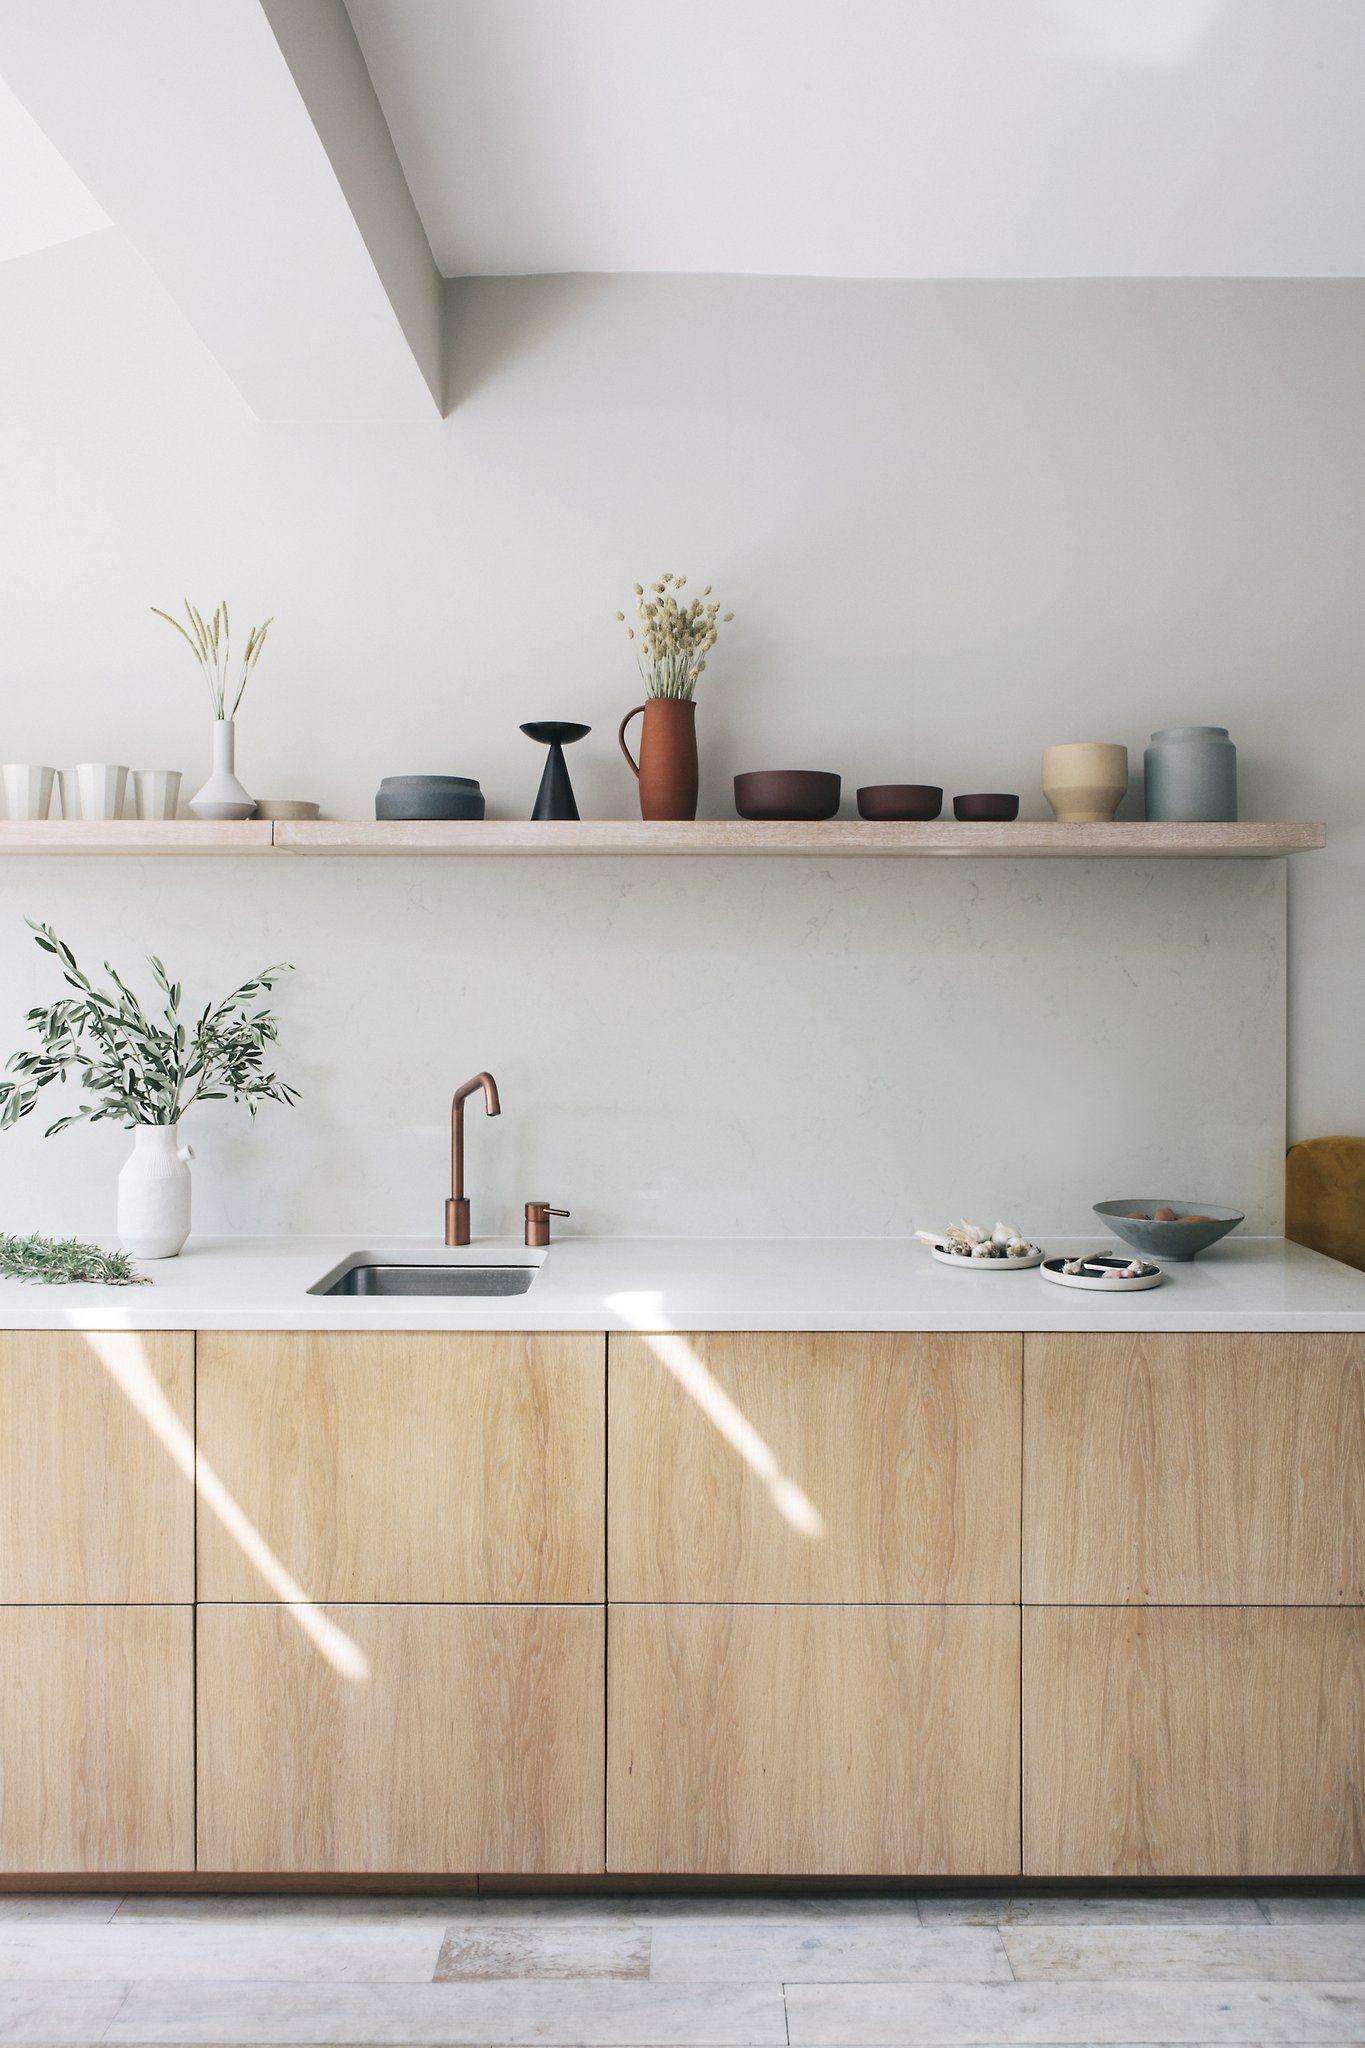 Mooie Lichte Keuken Via Customfronts Keuken In 2019 Ikea